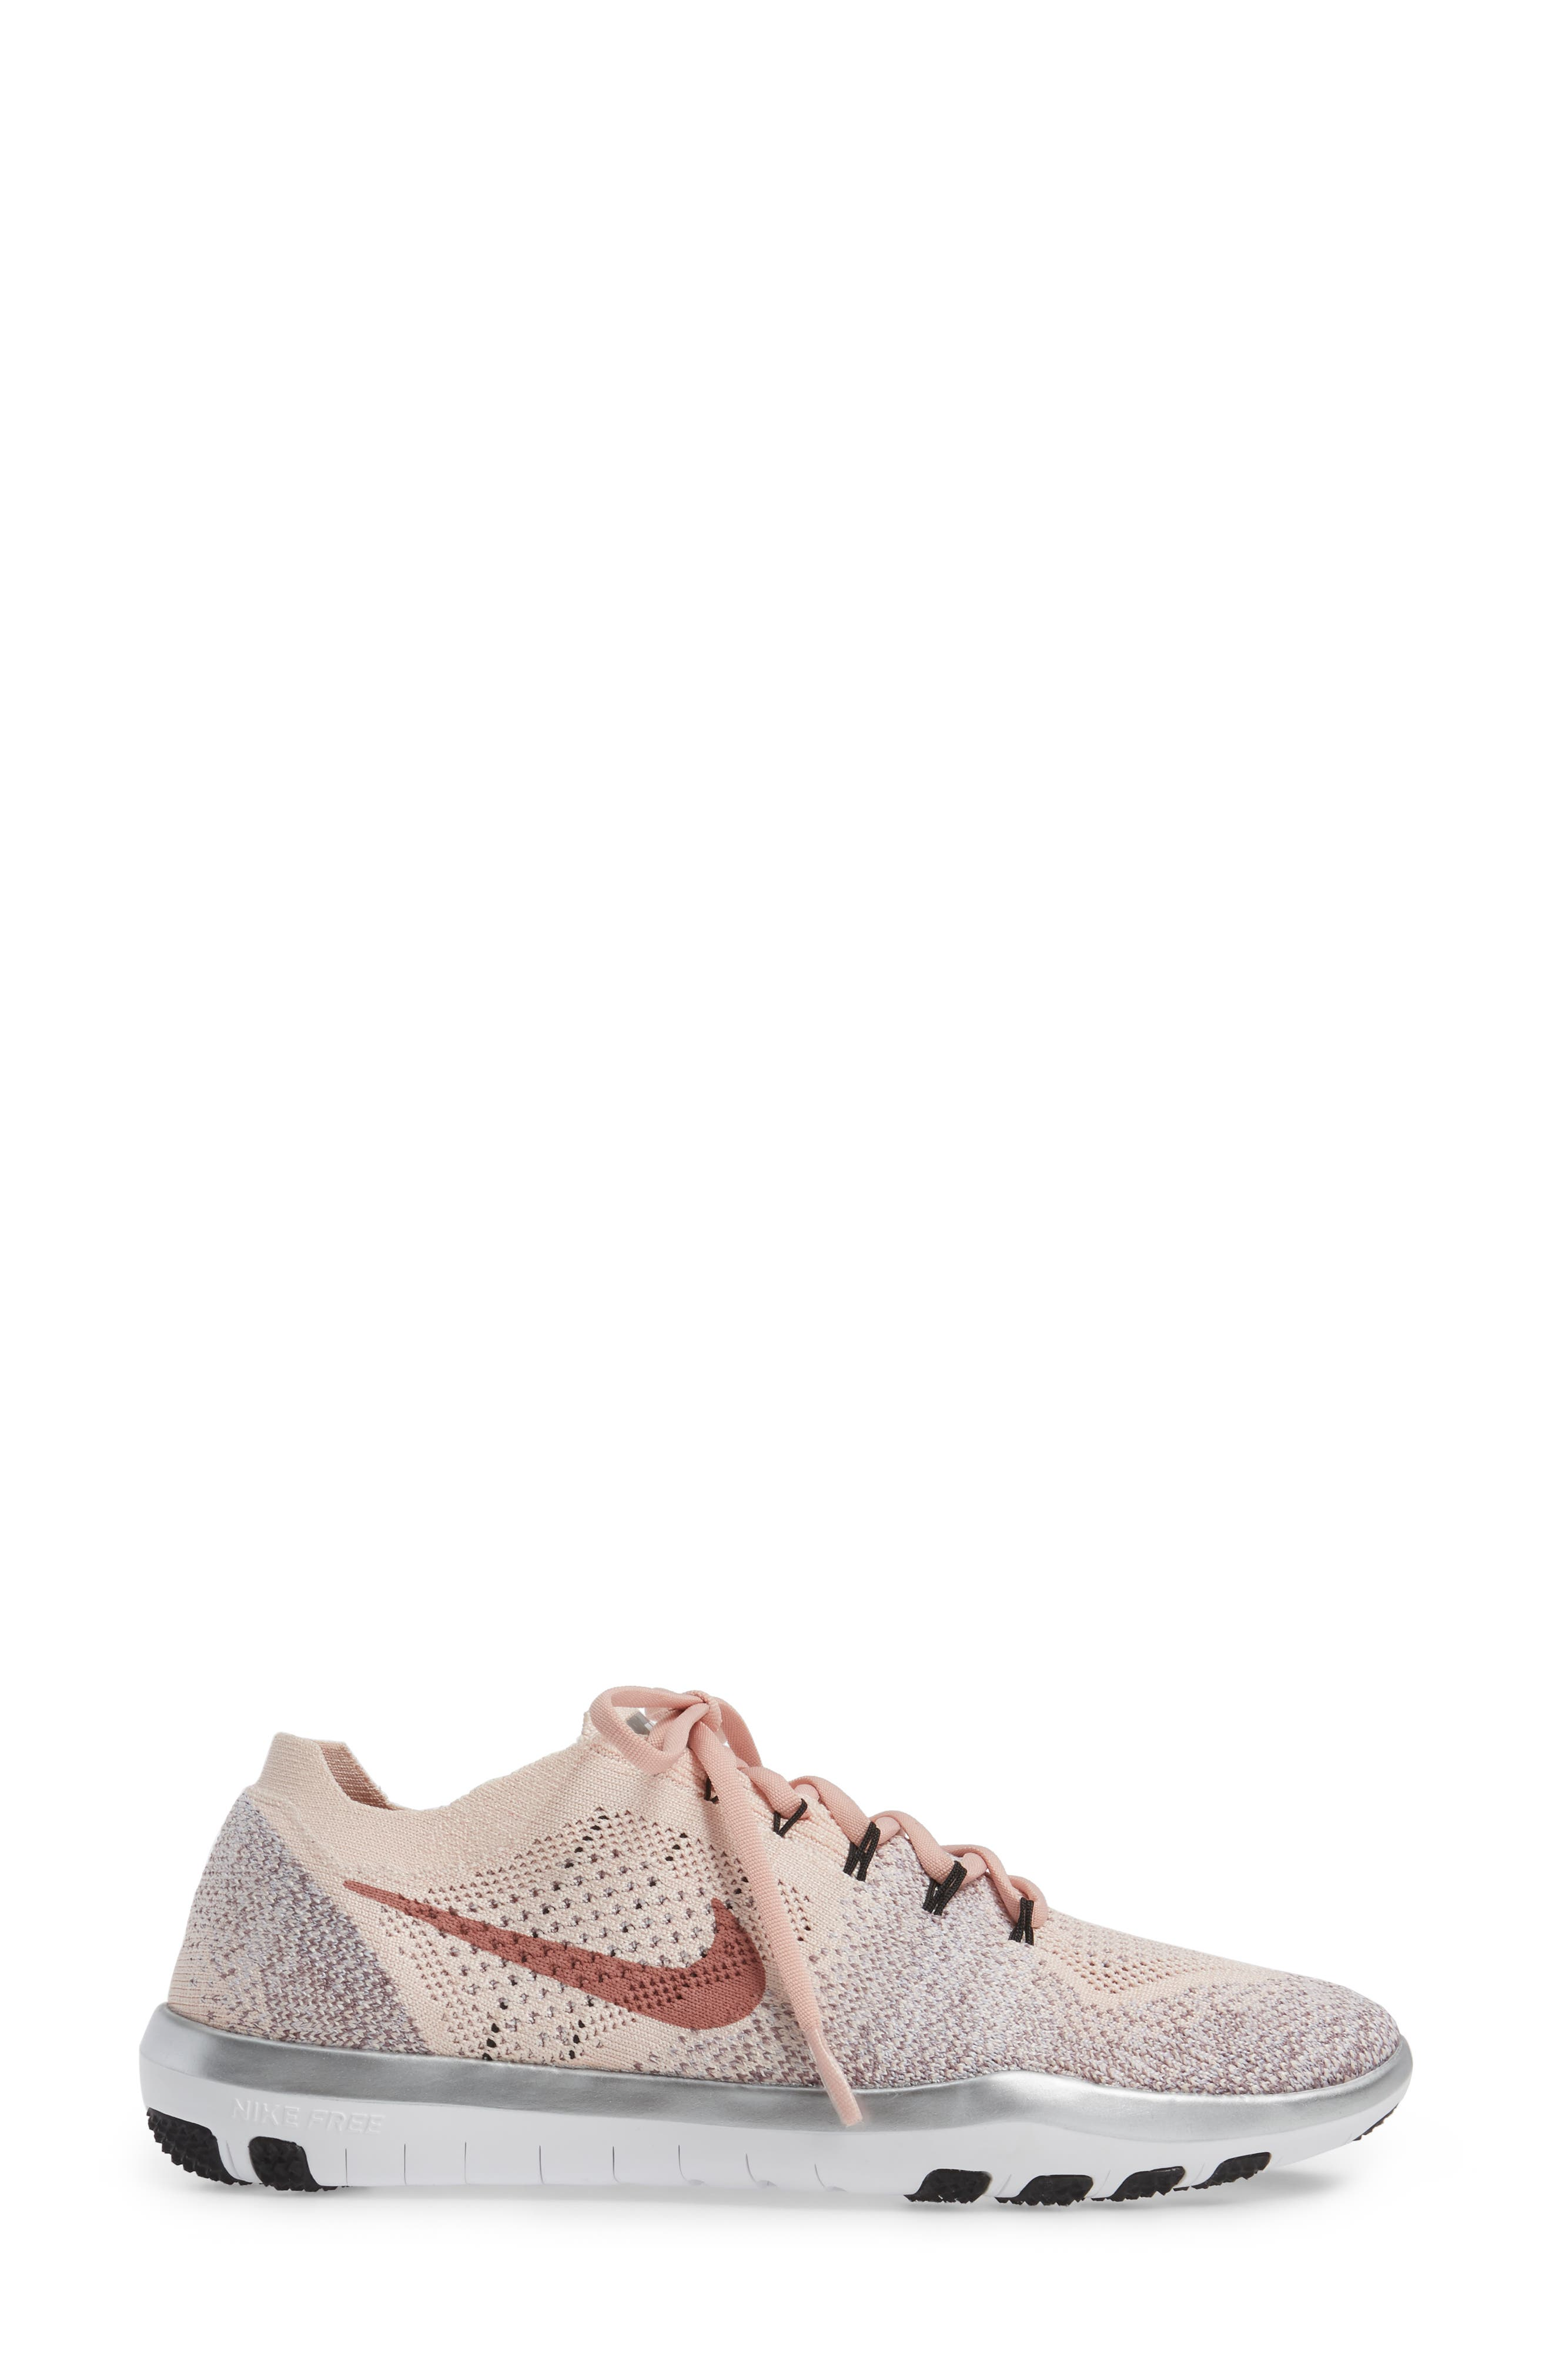 Alternate Image 3  - Nike Free Focus Flyknit 2 Bionic Training Shoe (Women)